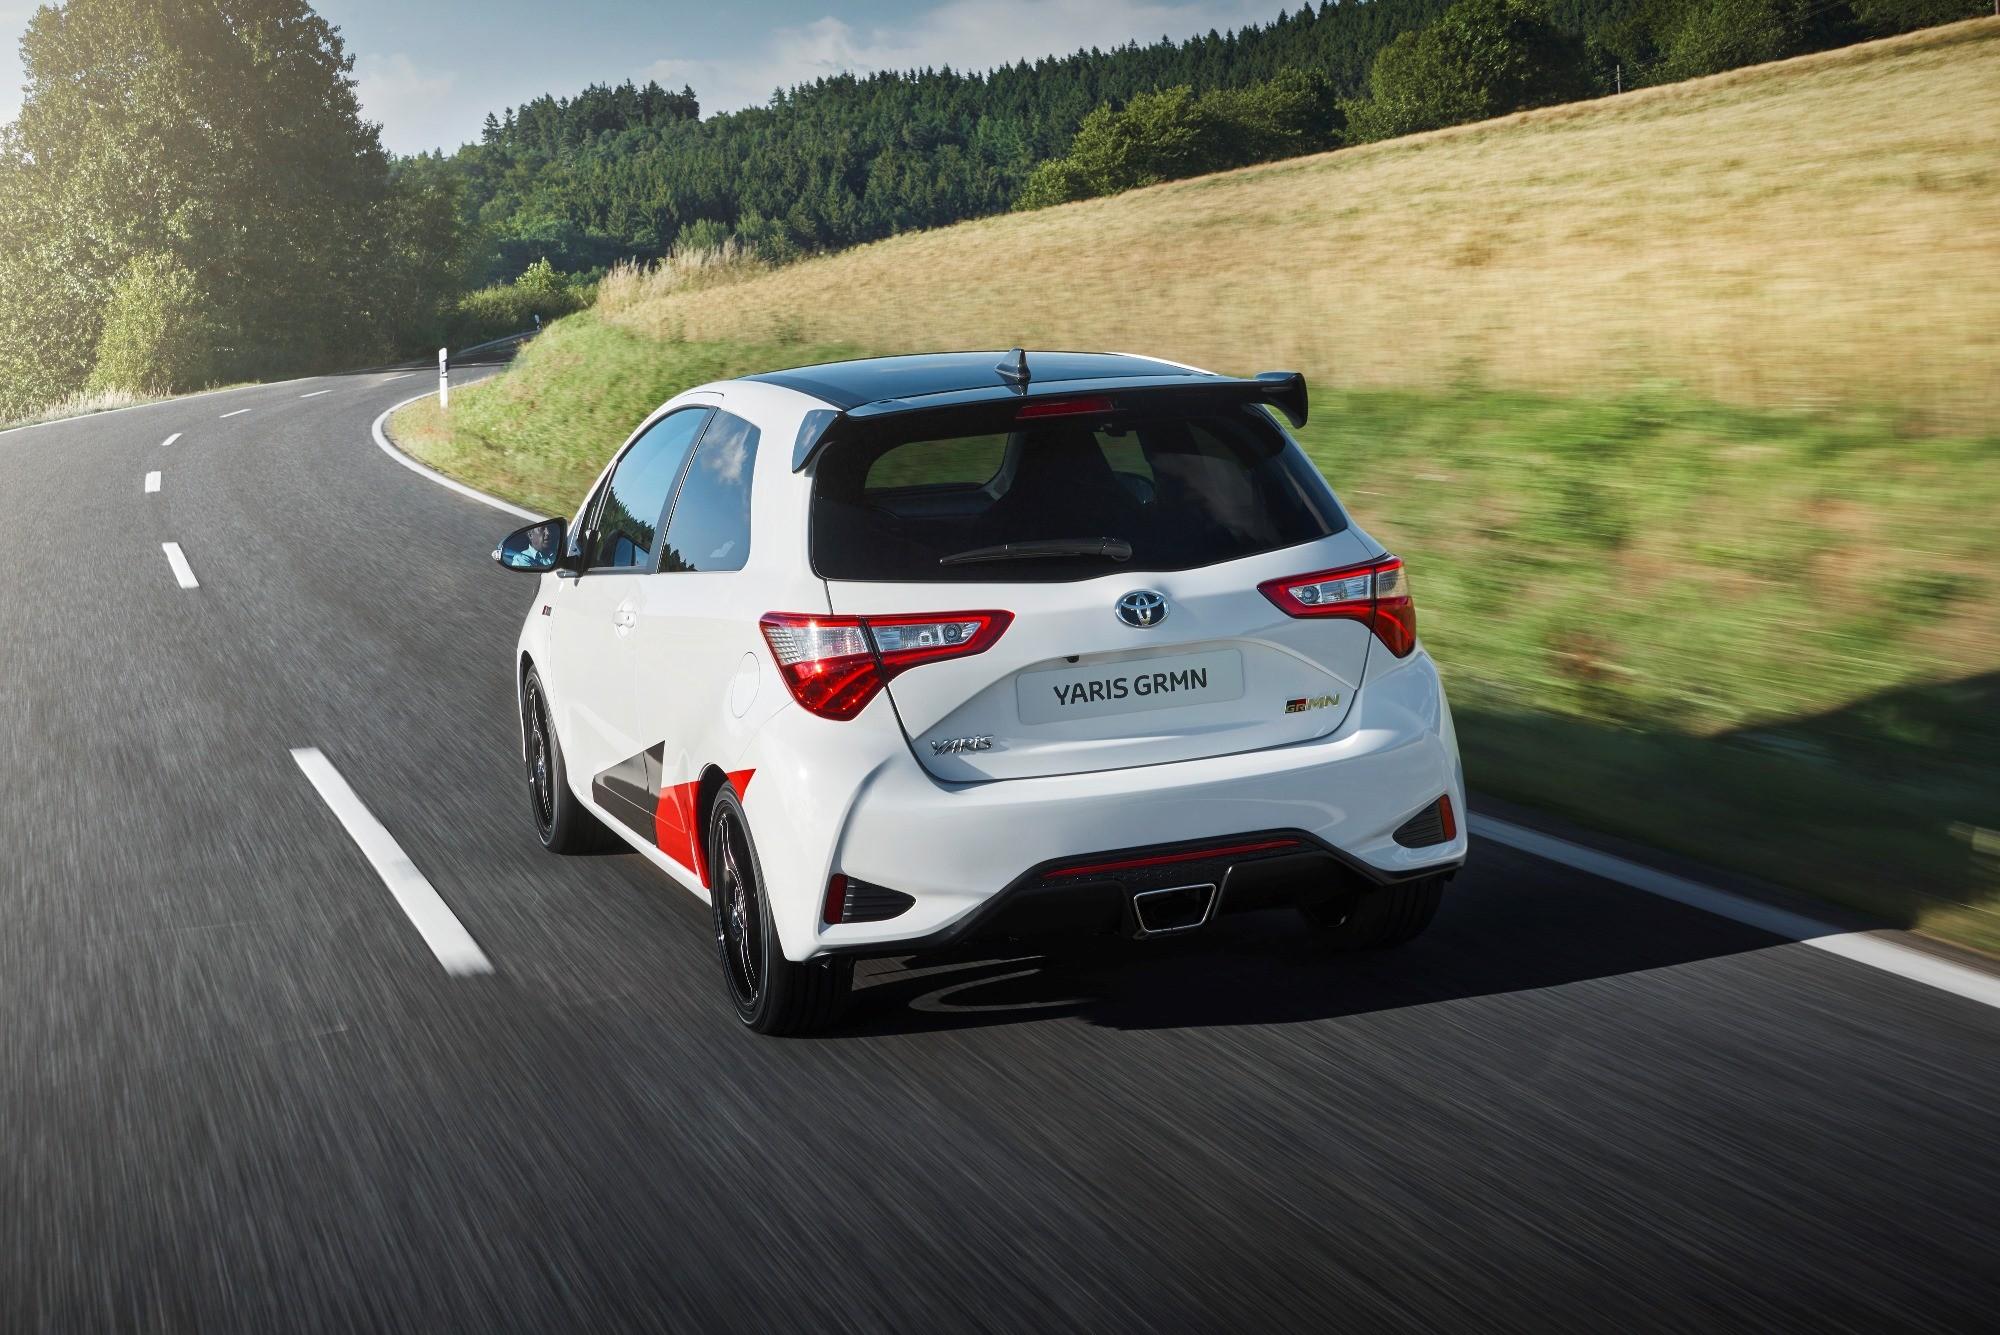 Polo Gti Sized 2018 Toyota Yaris Grmn Costs Golf Gti Money